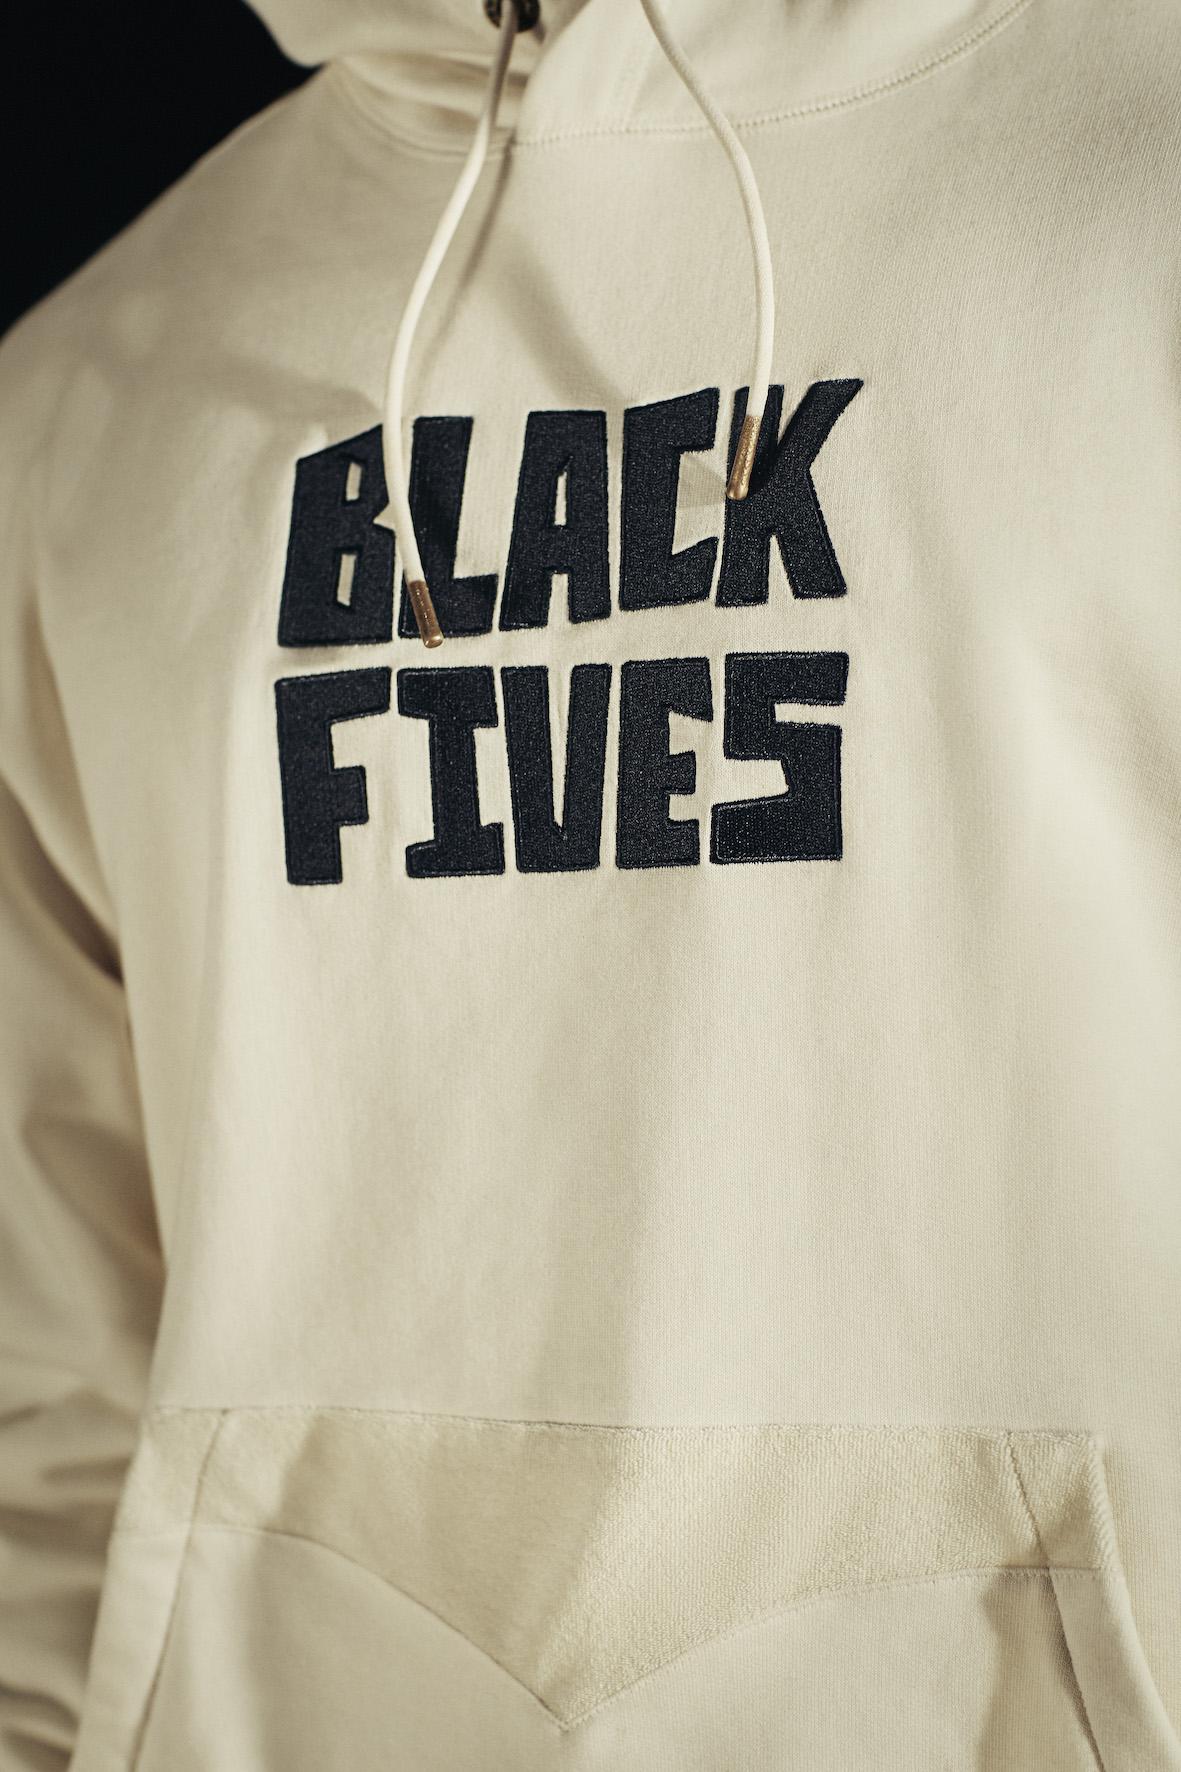 PUMA Black History Month